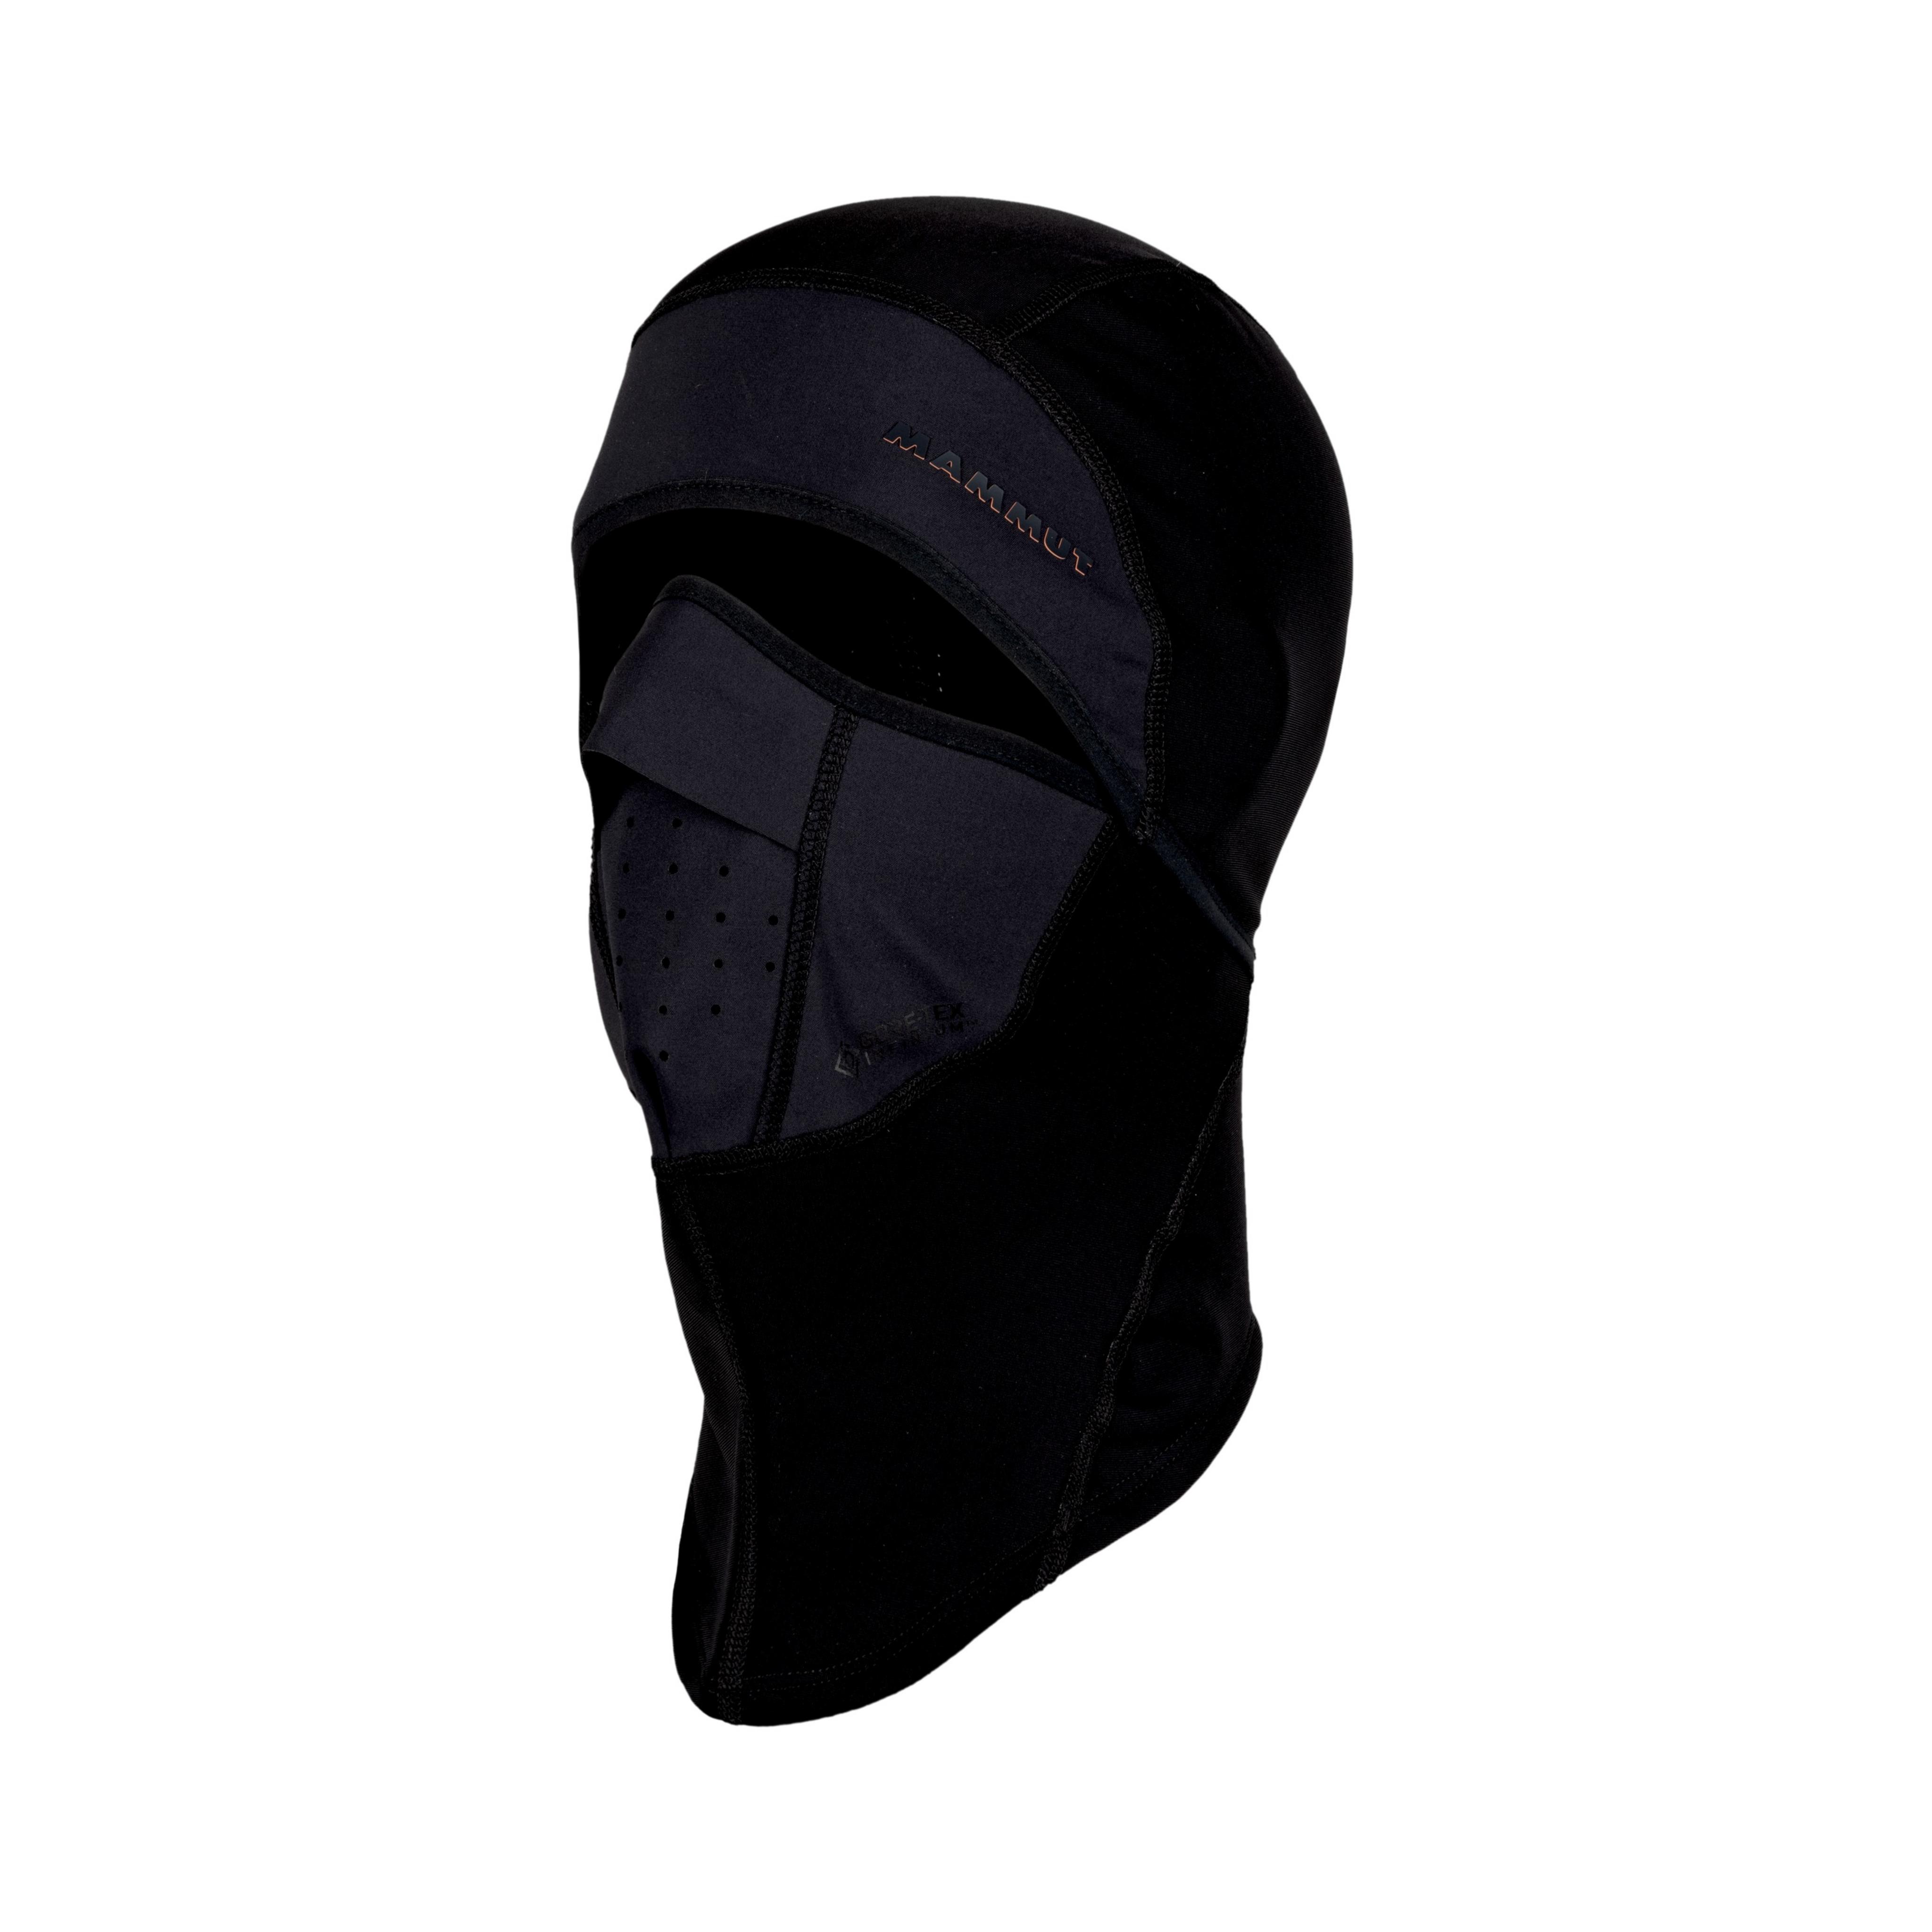 Balaclava Arctic WS - black, one size product image